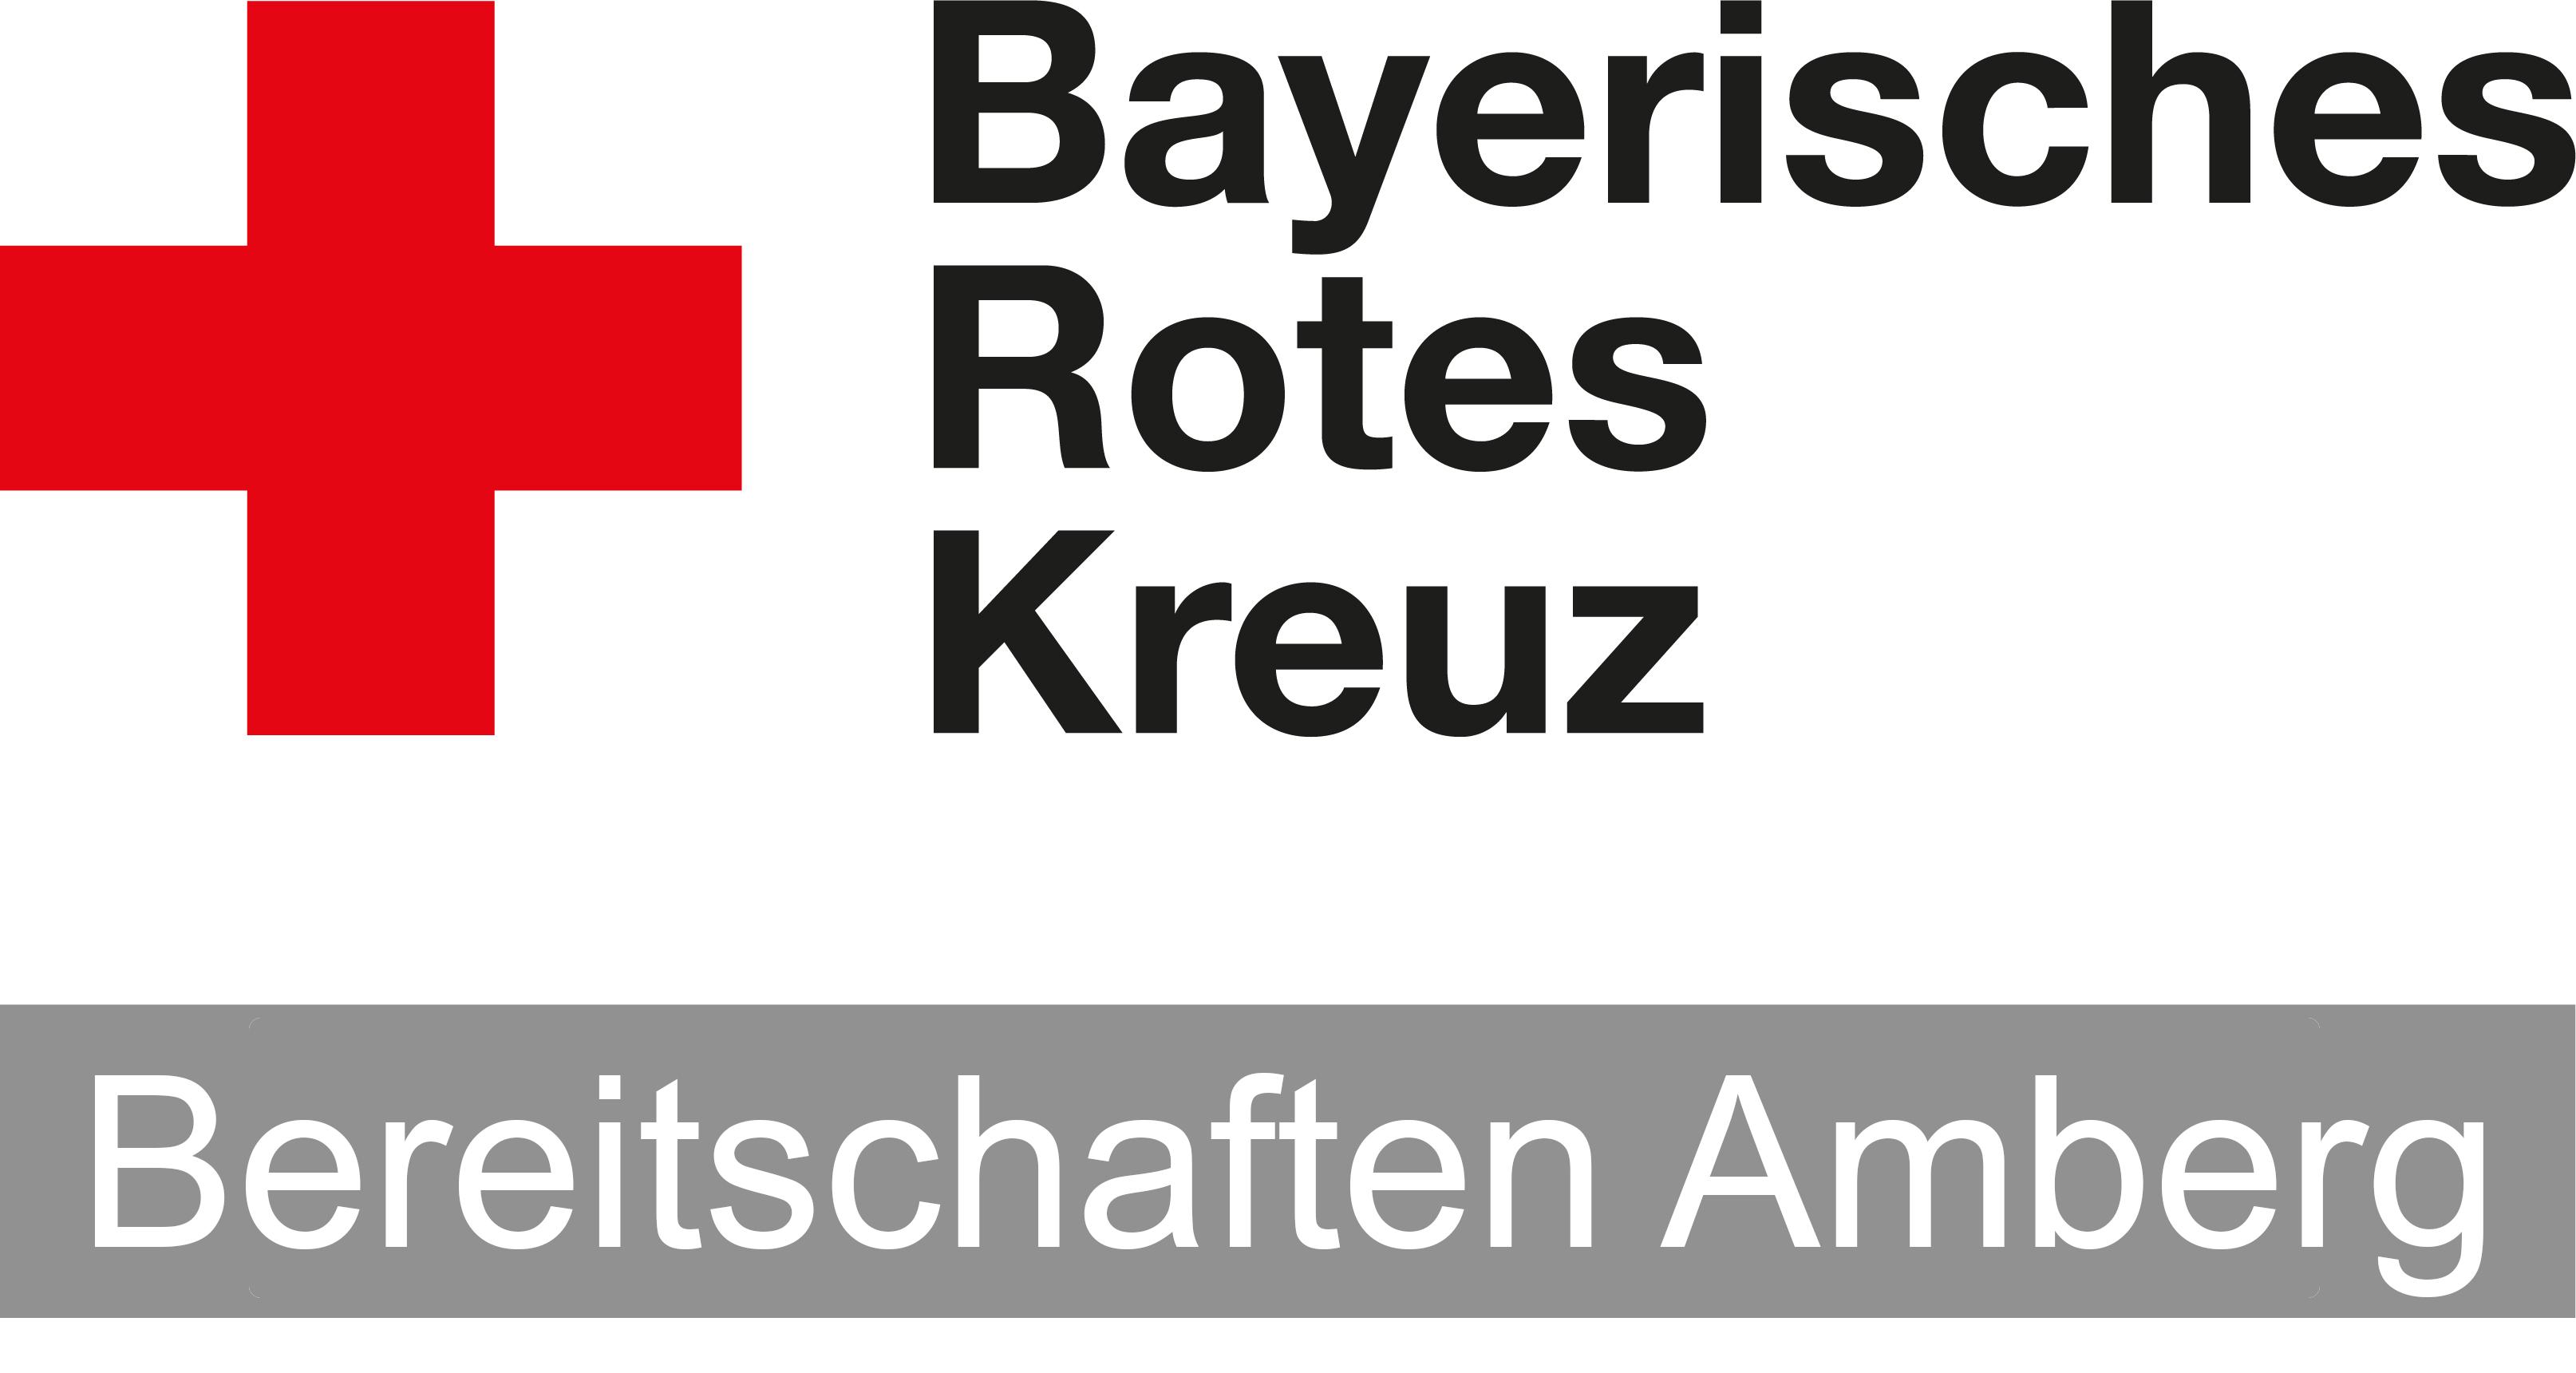 BRK Bereitschaften Amberg Logo